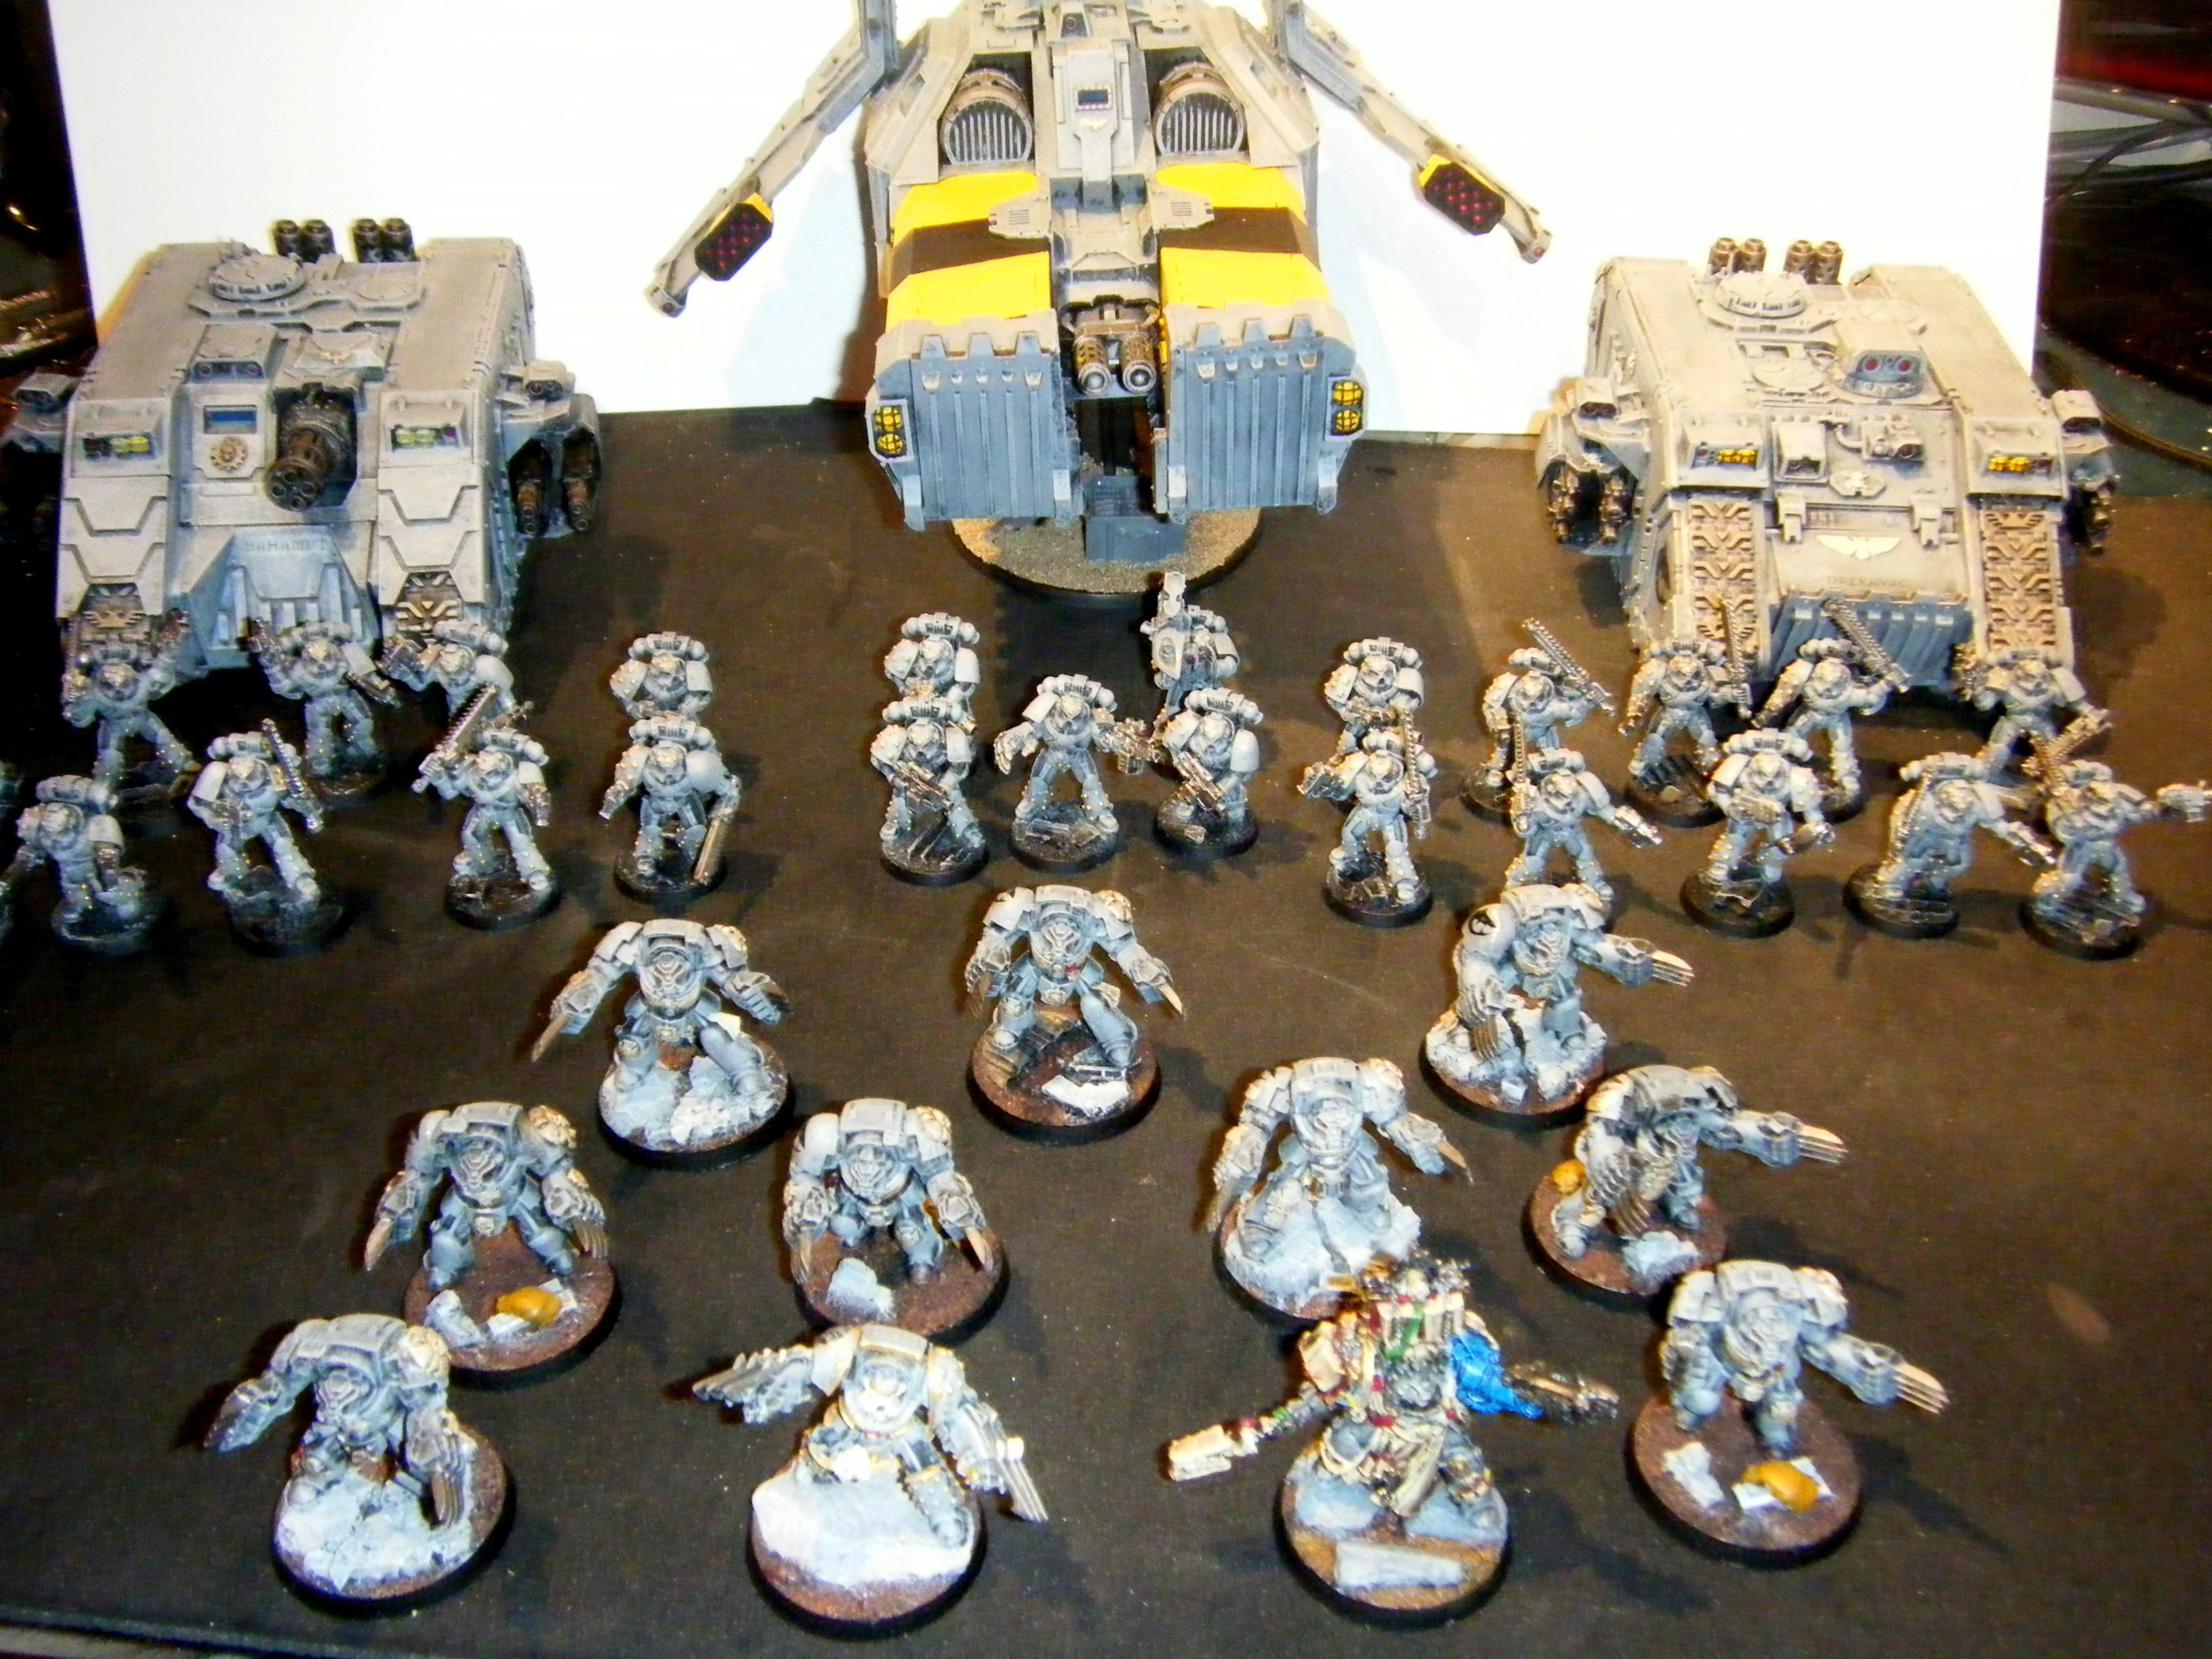 Armor, Assault, Carcharodons, Land, Librarian, Raiders, Ram, Sharks, Space, Sterngaurd, Tactical, Terminator Armor